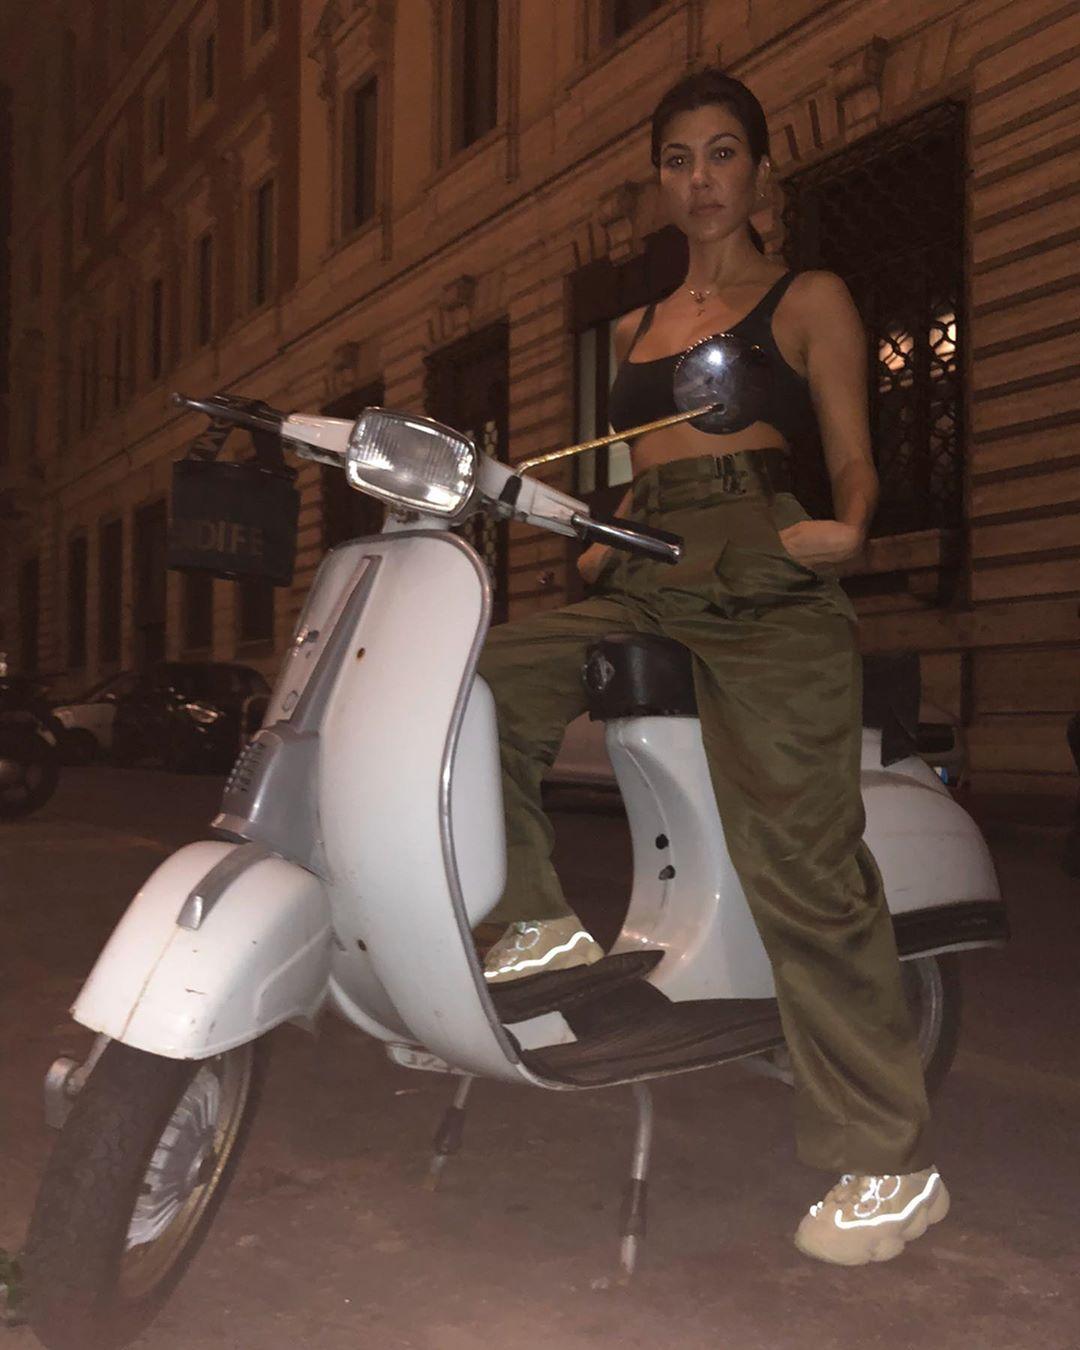 Kourtney Kardashian donning round white leather lace-up sneakers